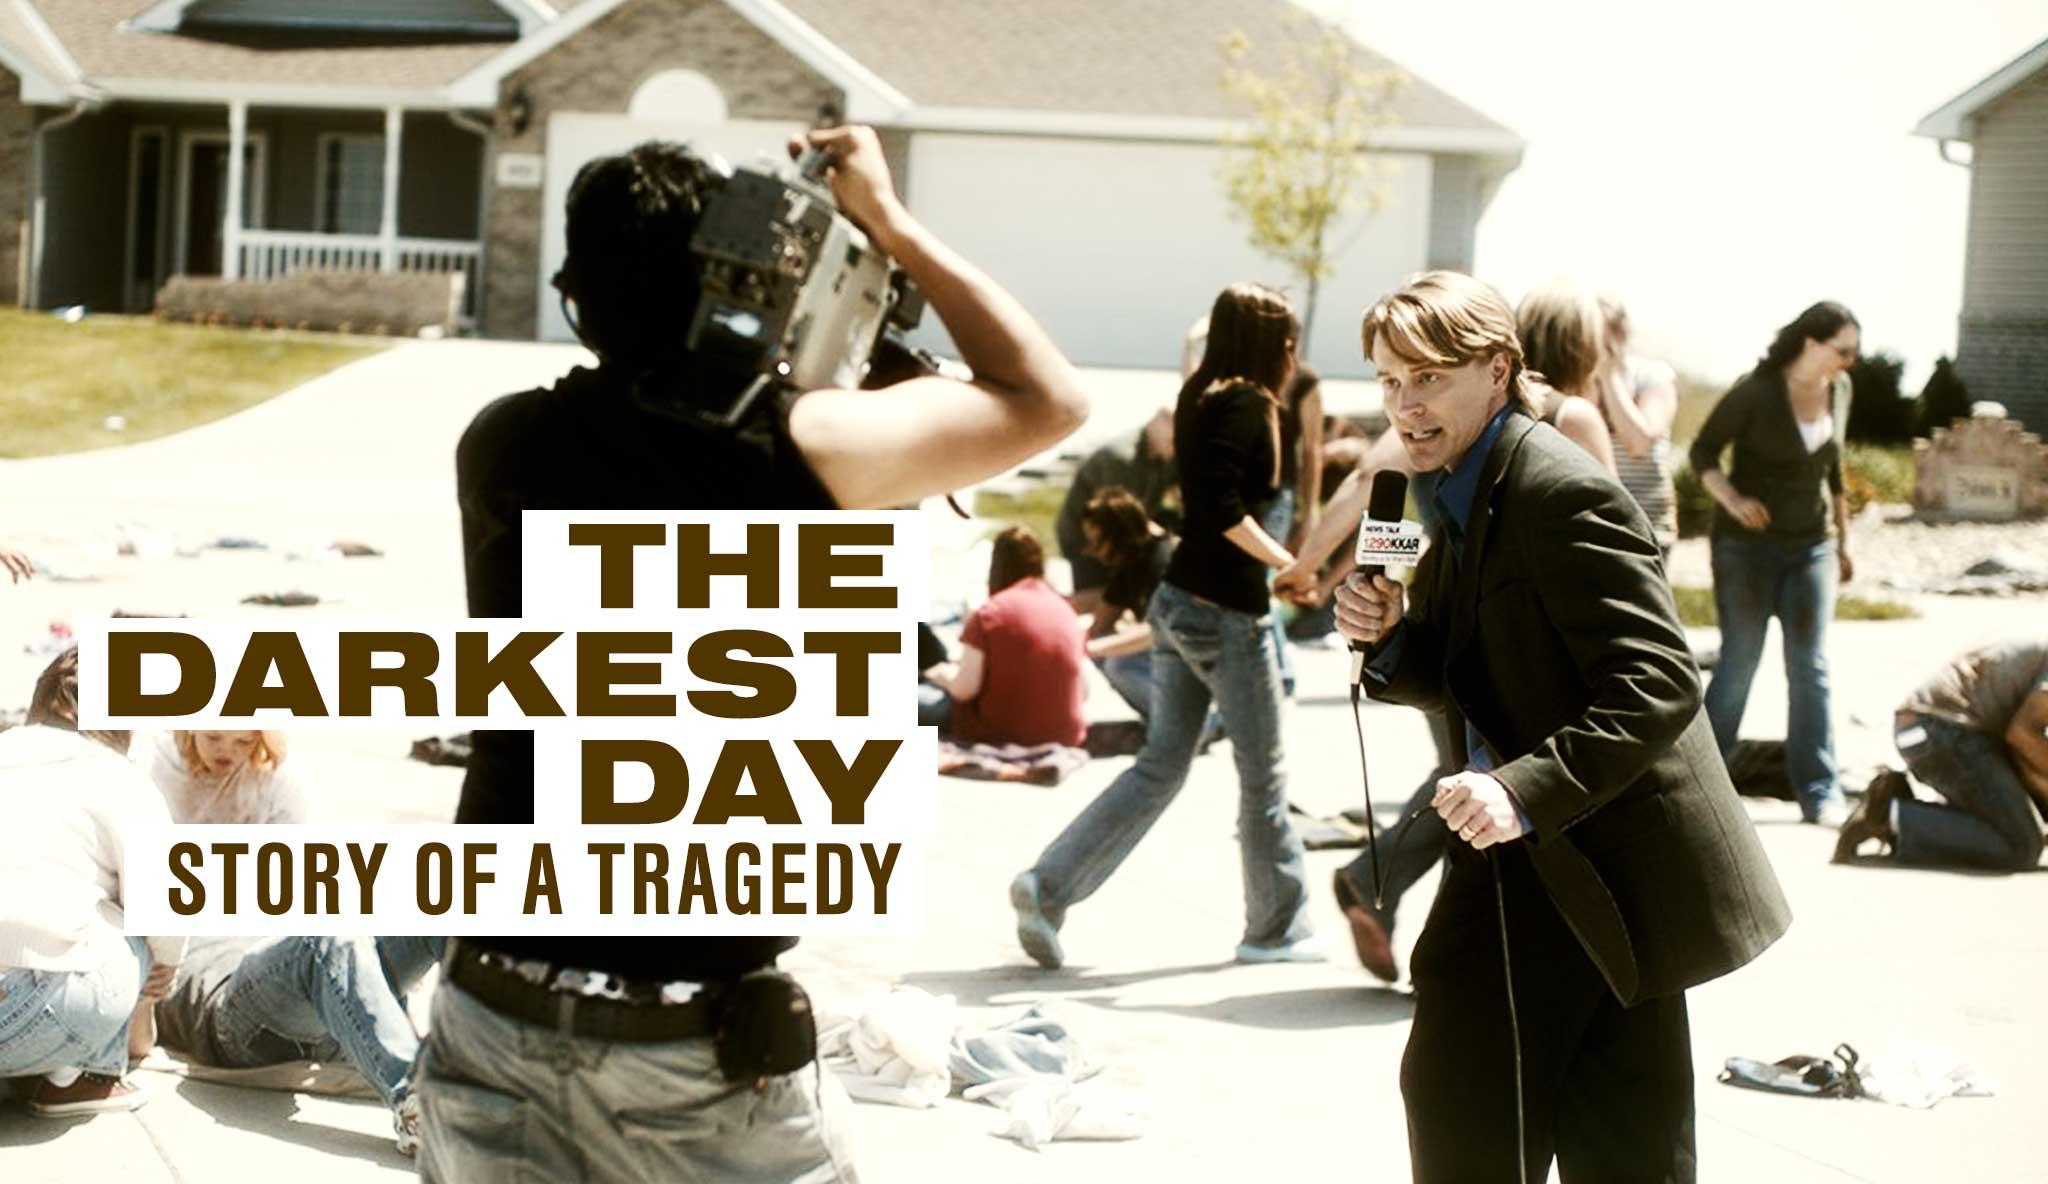 the-darkest-day-story-of-a-tragedy\header.jpg